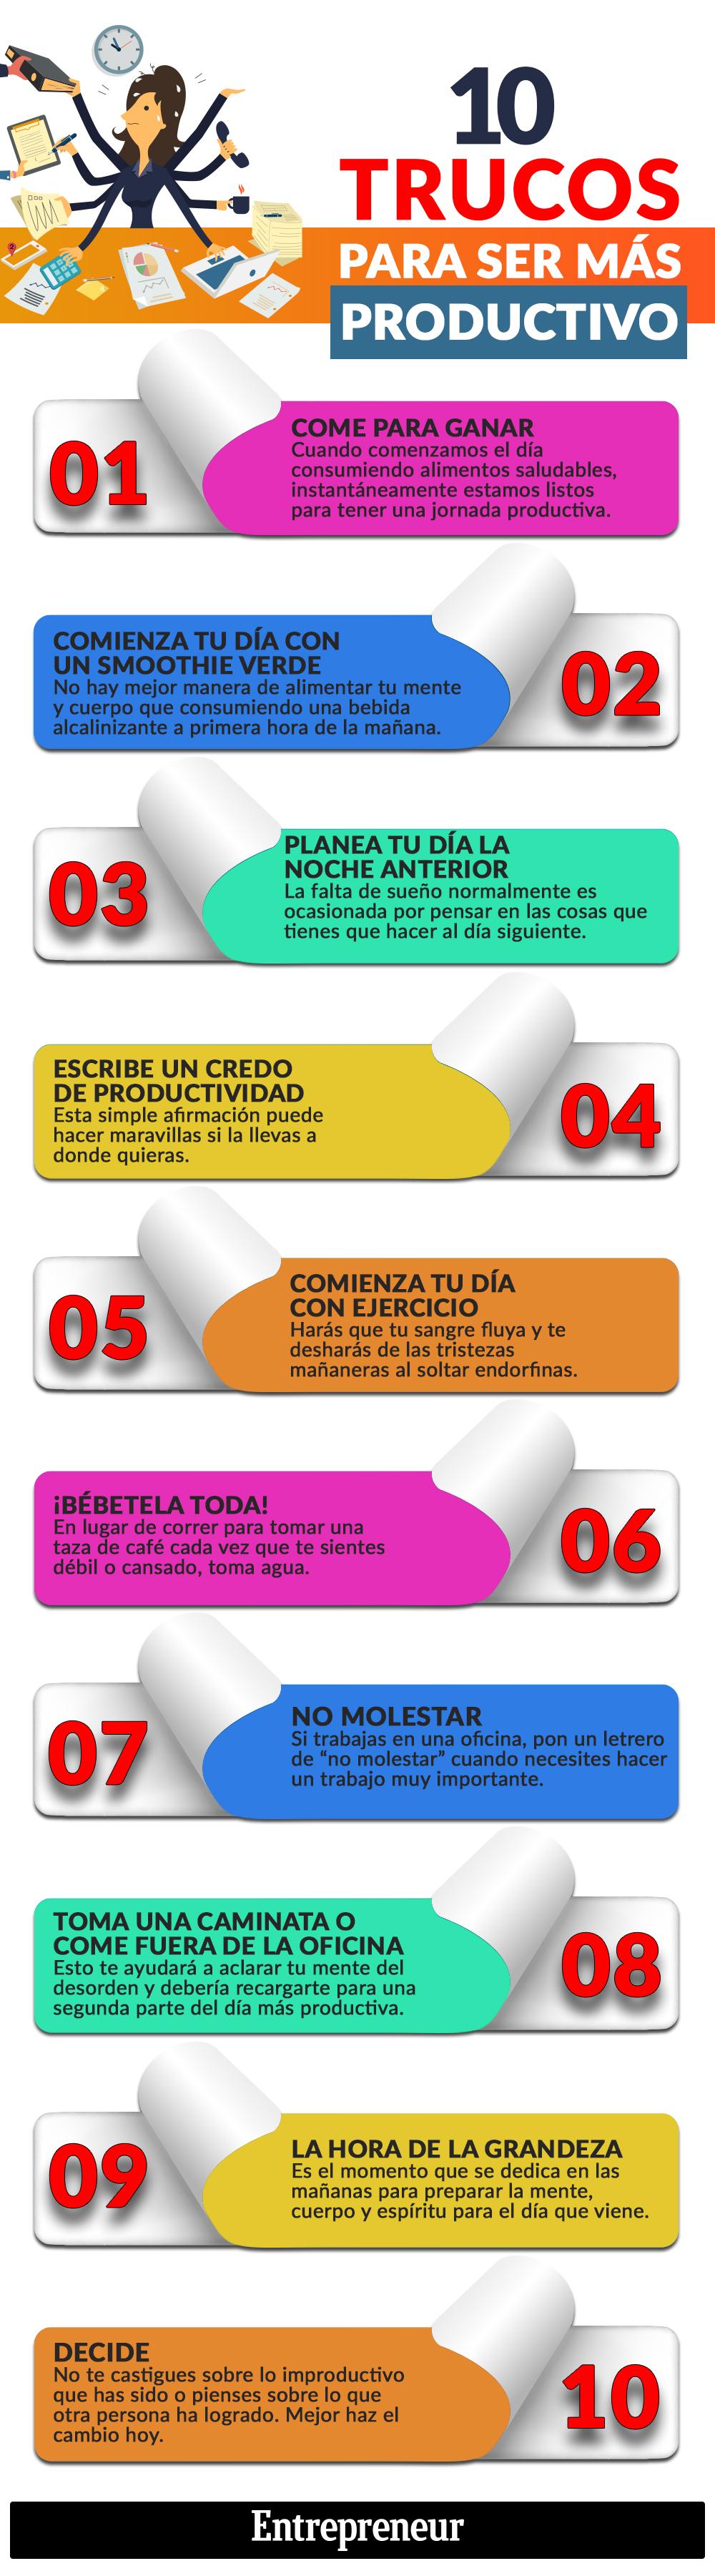 10 trucos para ser más productivo #infografia #infographic #rrhh